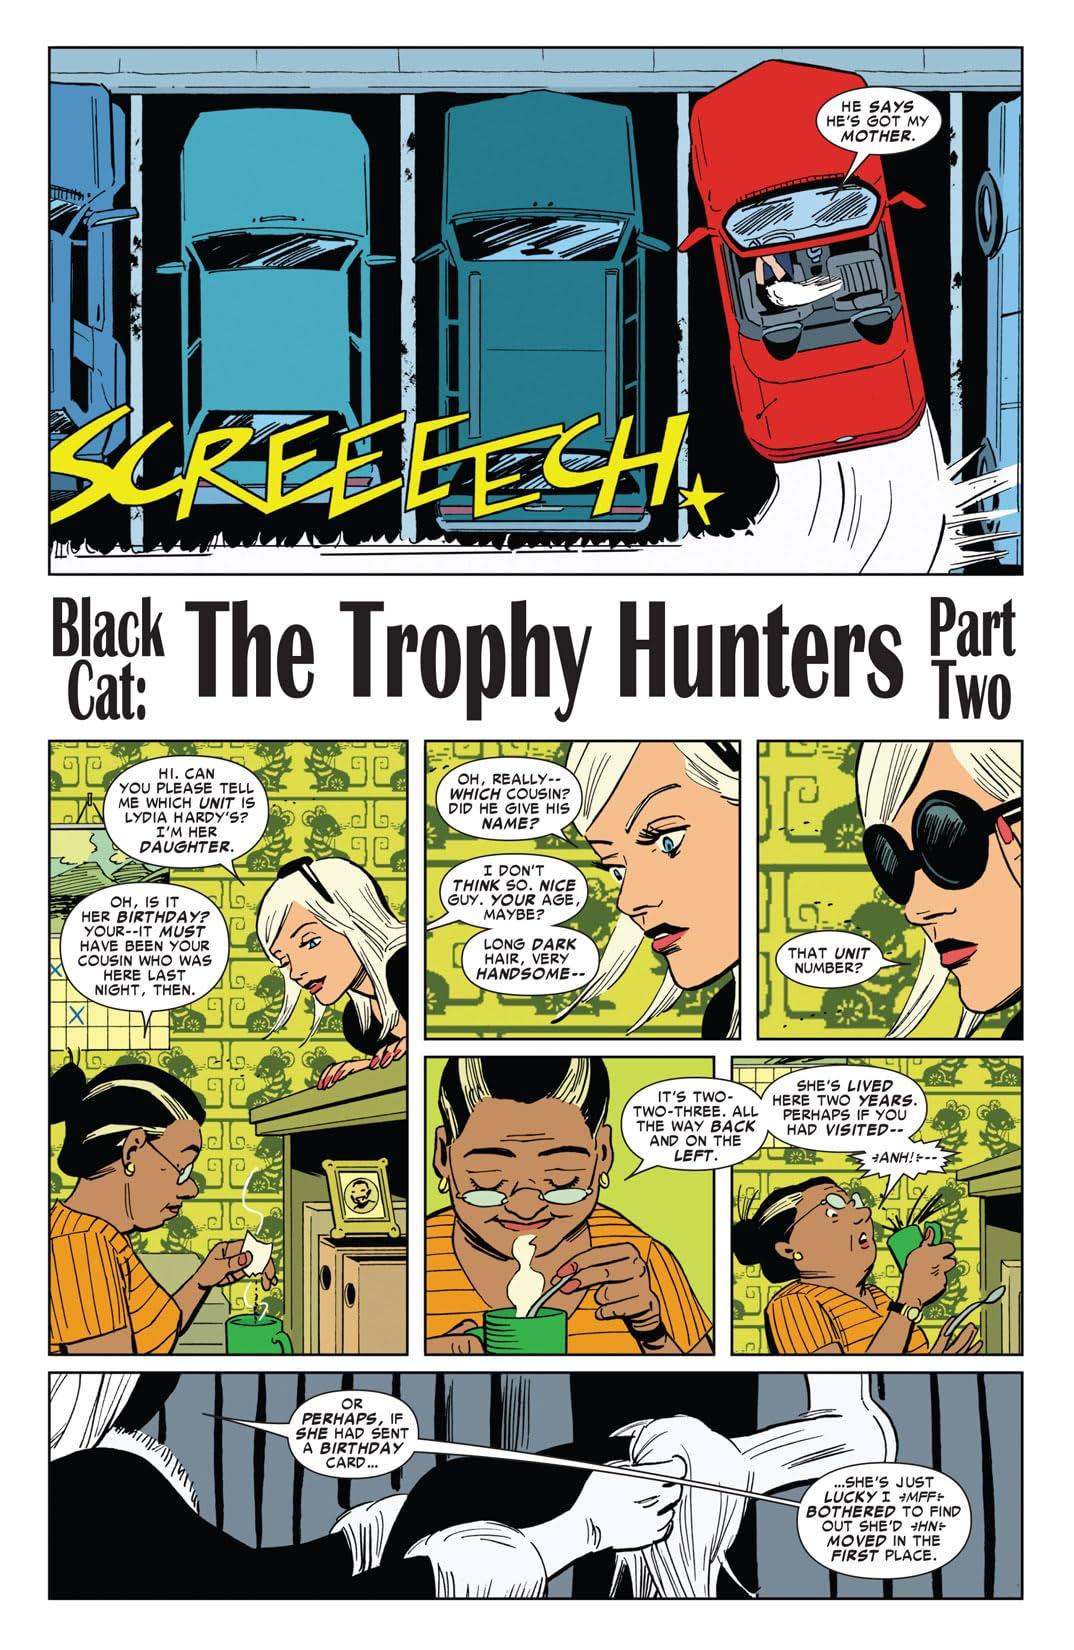 Amazing Spider-Man Presents: Black Cat #2 (of 4)